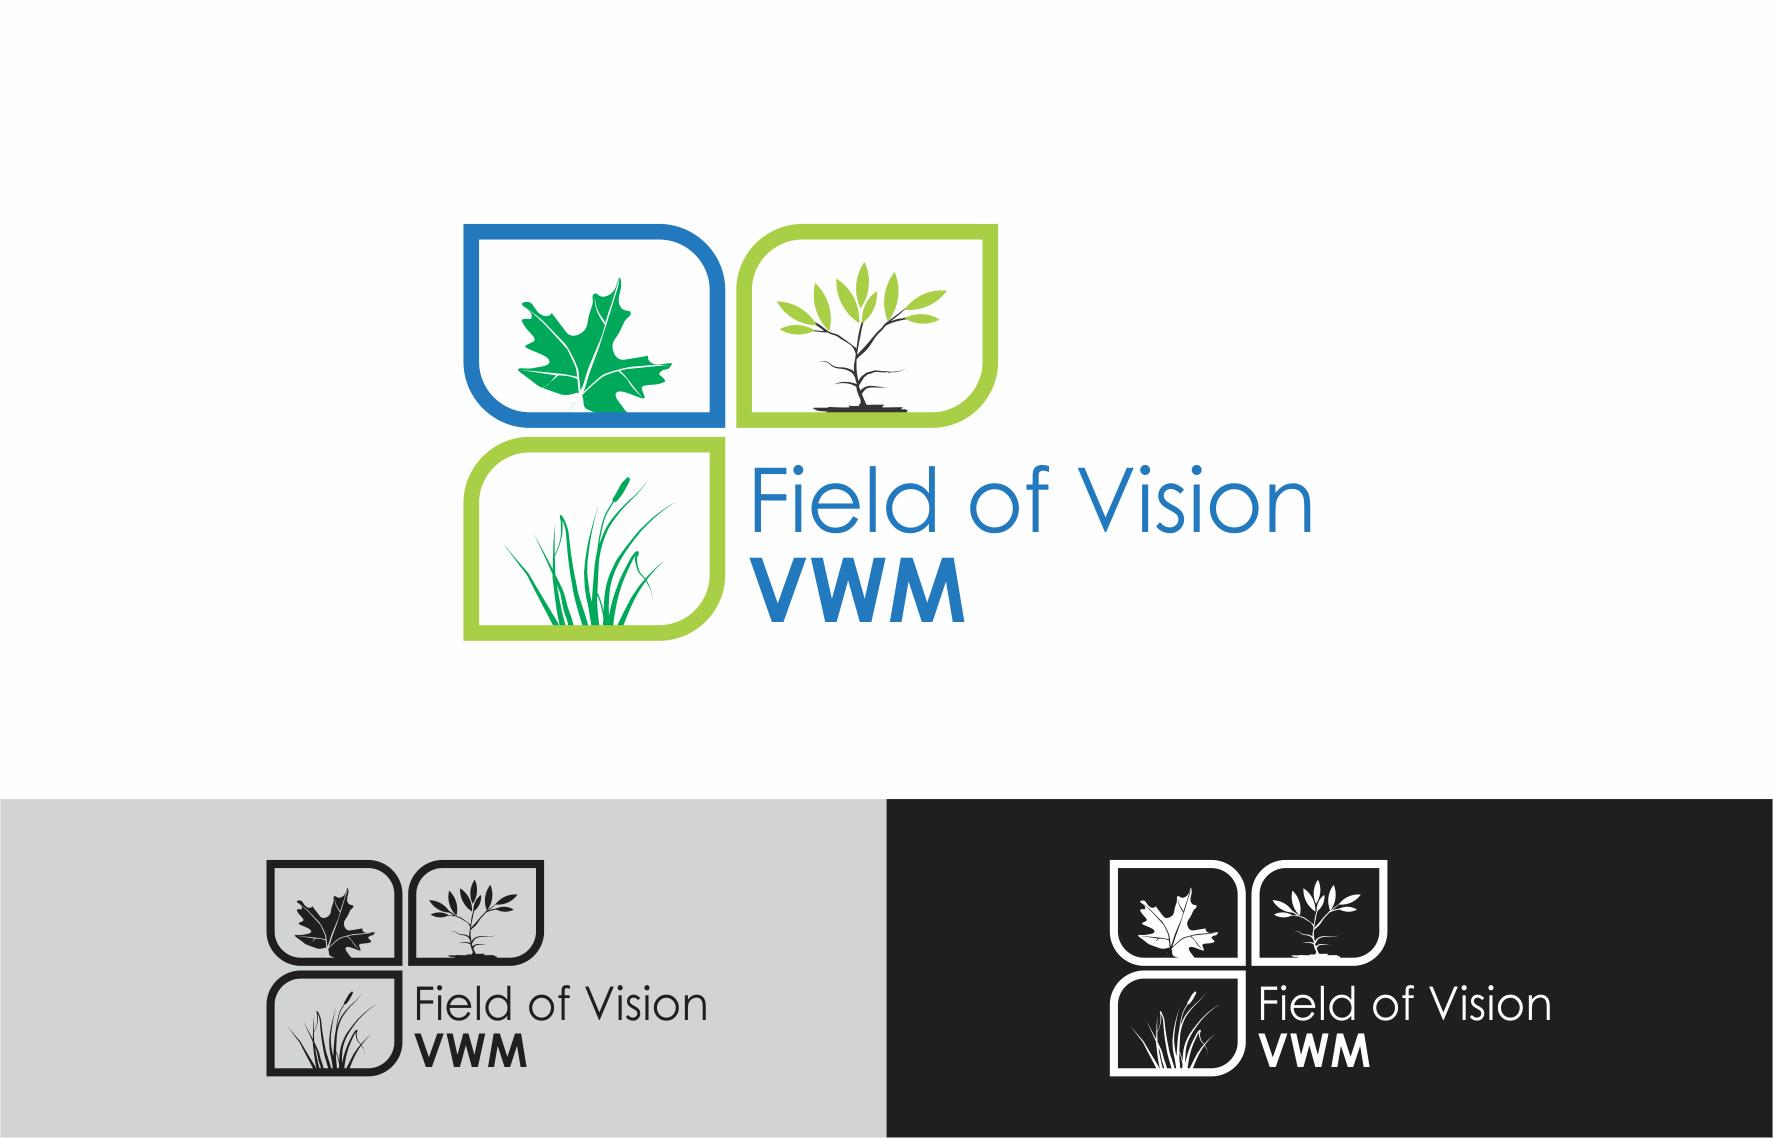 Logo Design by Private User - Entry No. 23 in the Logo Design Contest Field of Vision - VWM Logo Design.